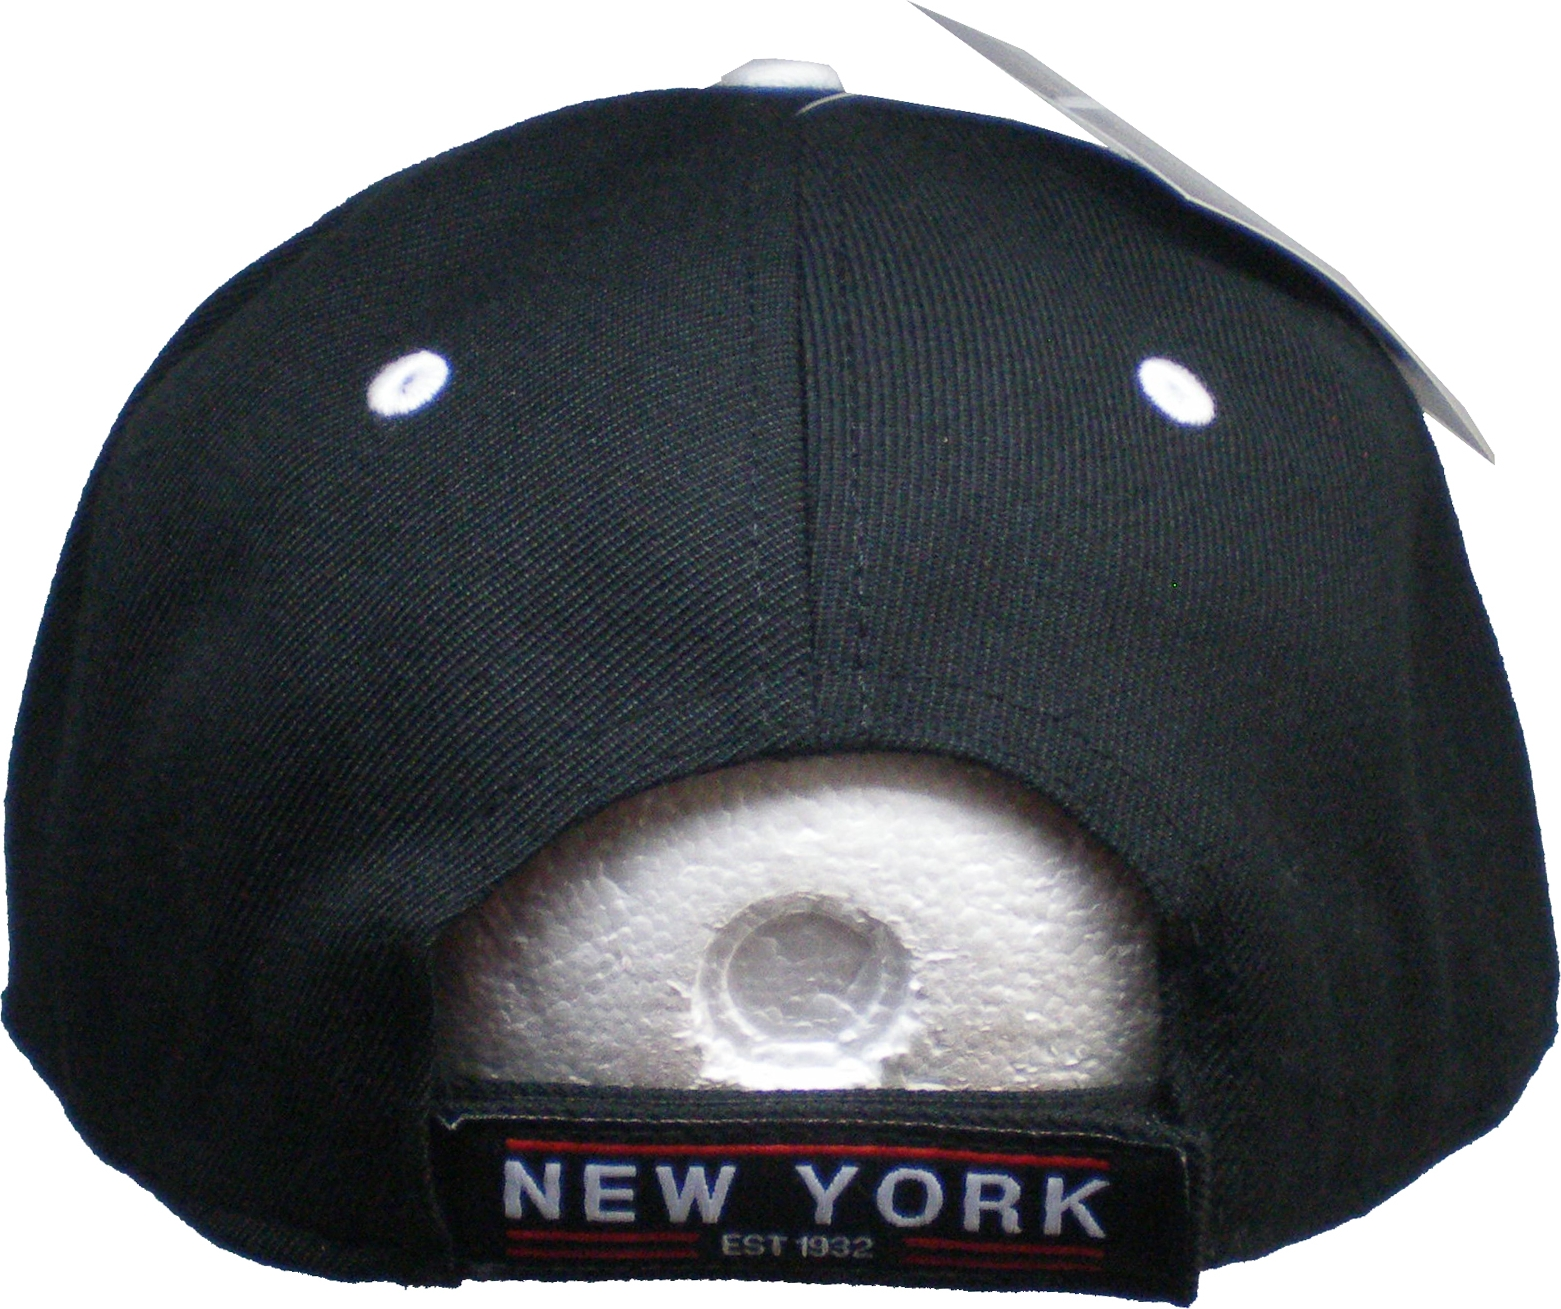 Nlbm Black Yankees Legacy Adjustable Cap